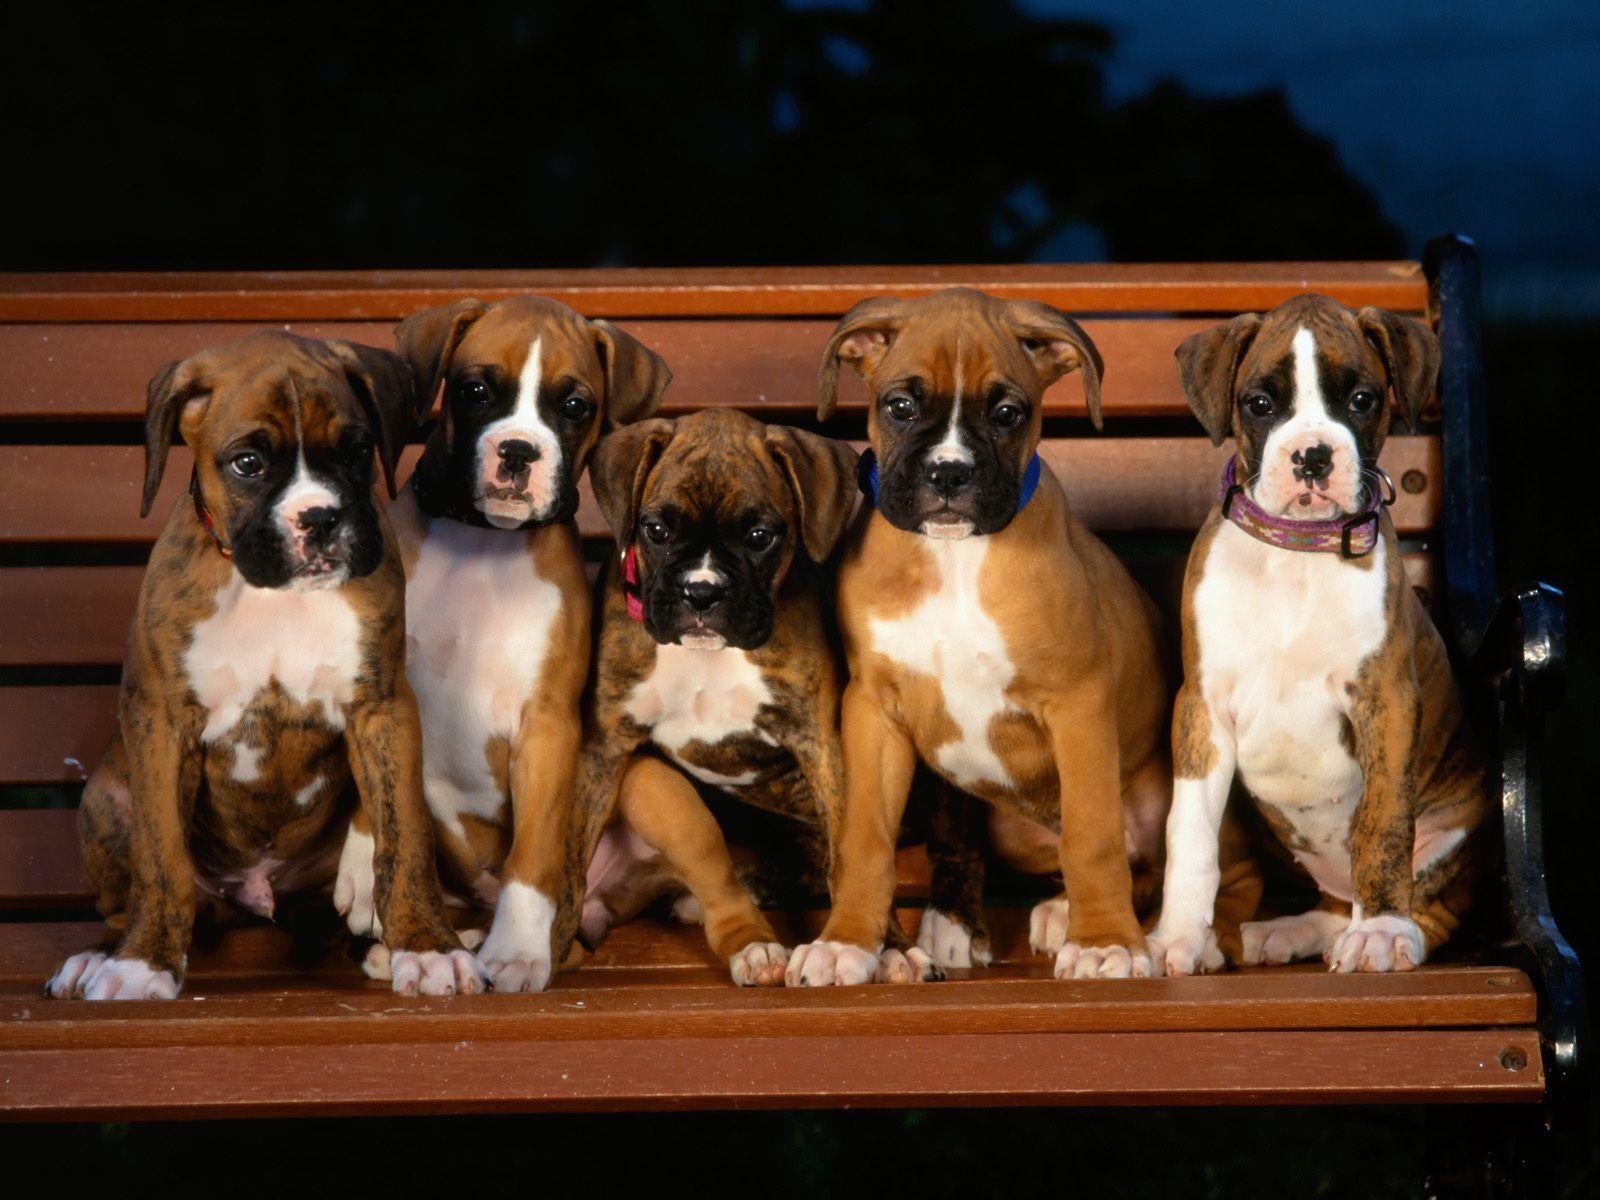 Boxer Dog Wallpapers | WallpapersIn4k.net